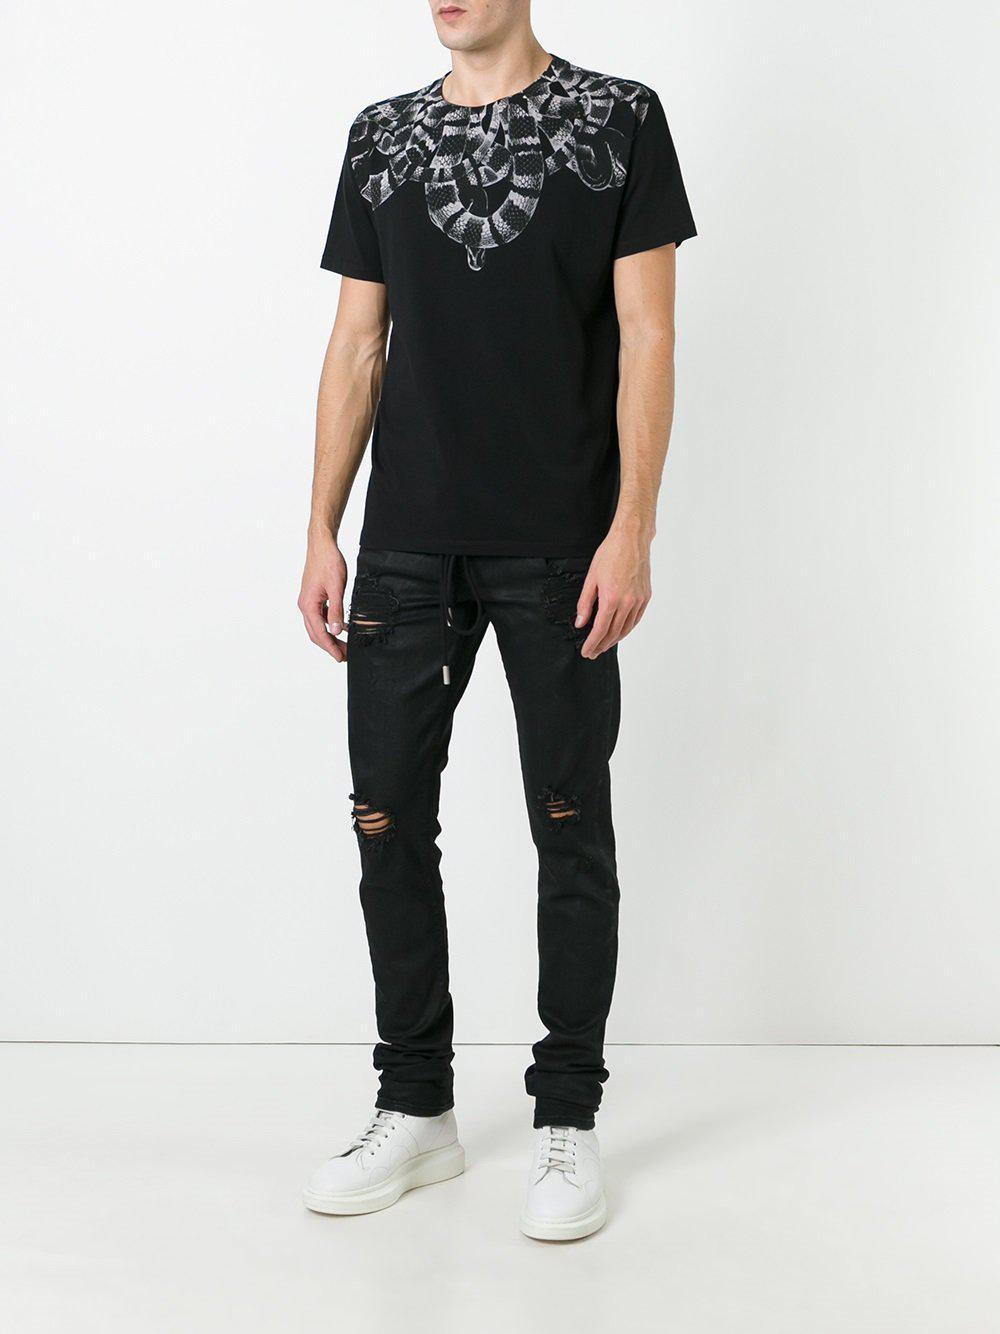 04599f0b578f Lyst - Off-White c o Virgil Abloh Ripped Drawstring Skinny Jeans in Black  for Men